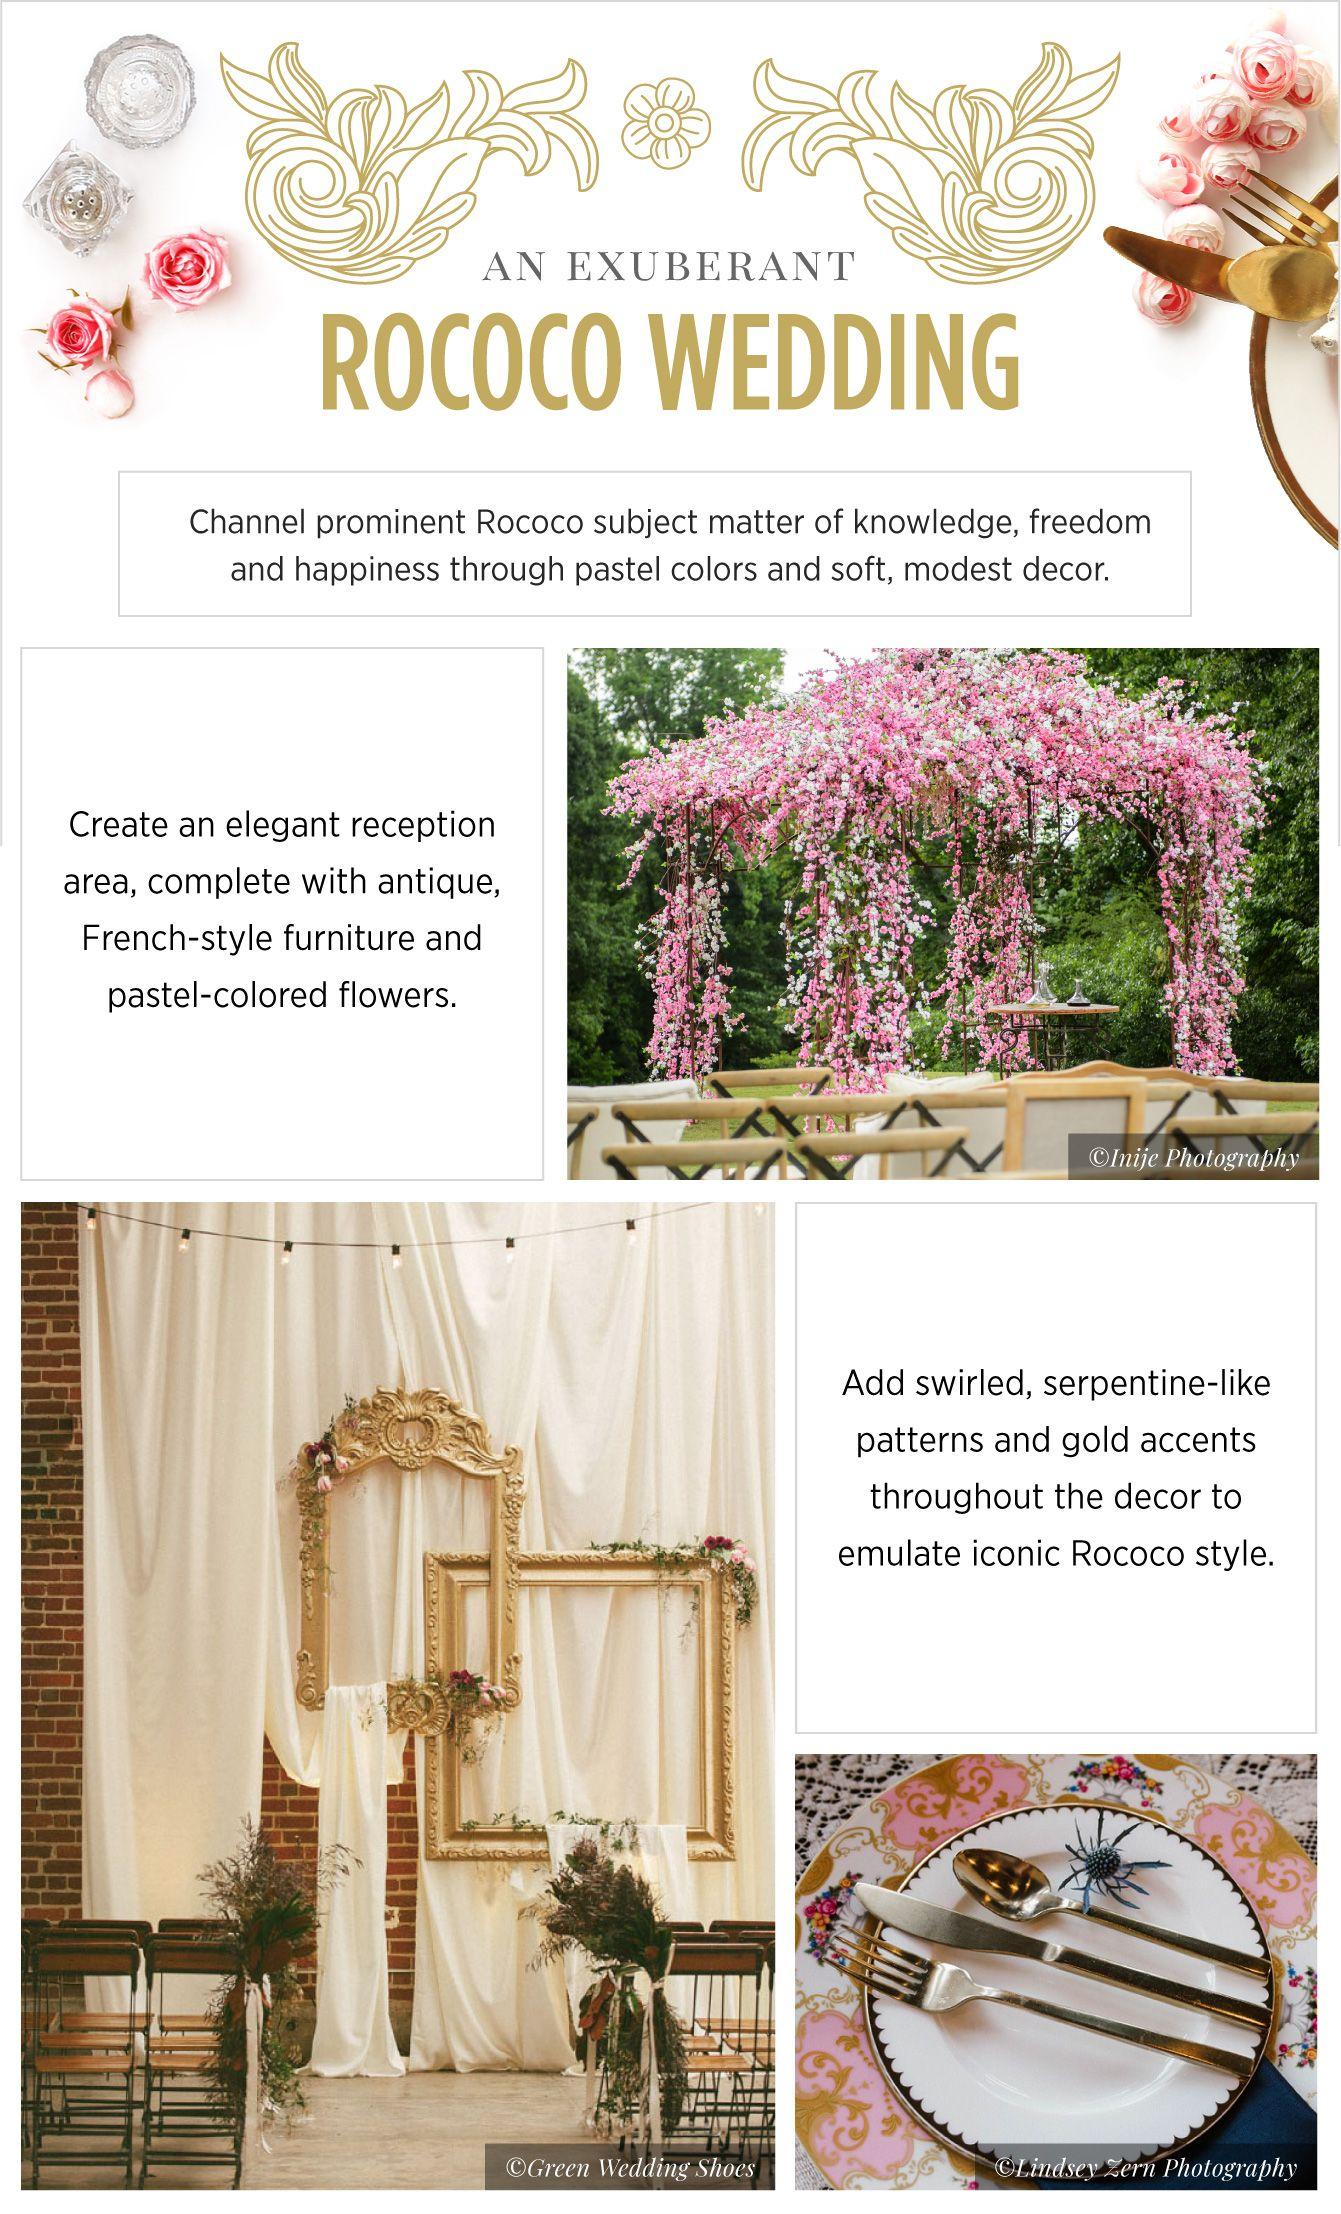 Wedding Decoration Ideas Inspired by Art Movements   Wedding decorations,  Wedding, Art nouveau weddings